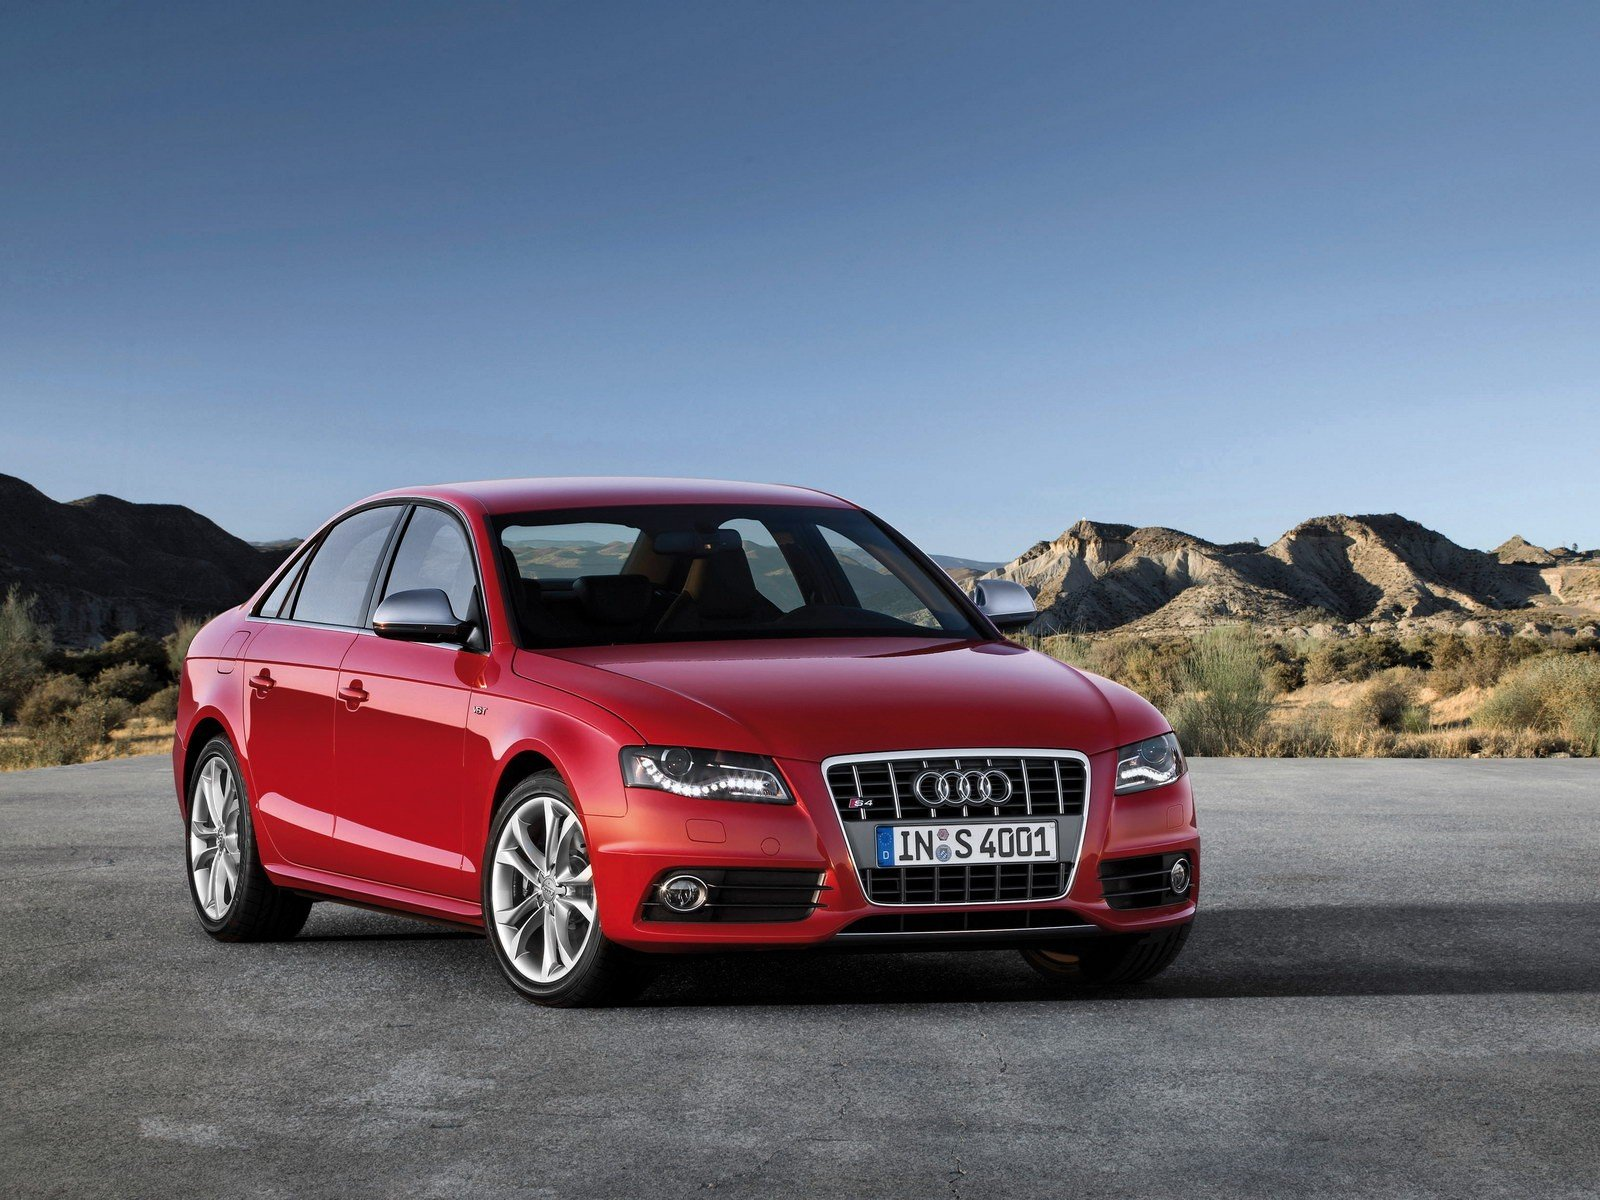 Audi s4 HD Wallpaper Download 1600x1200